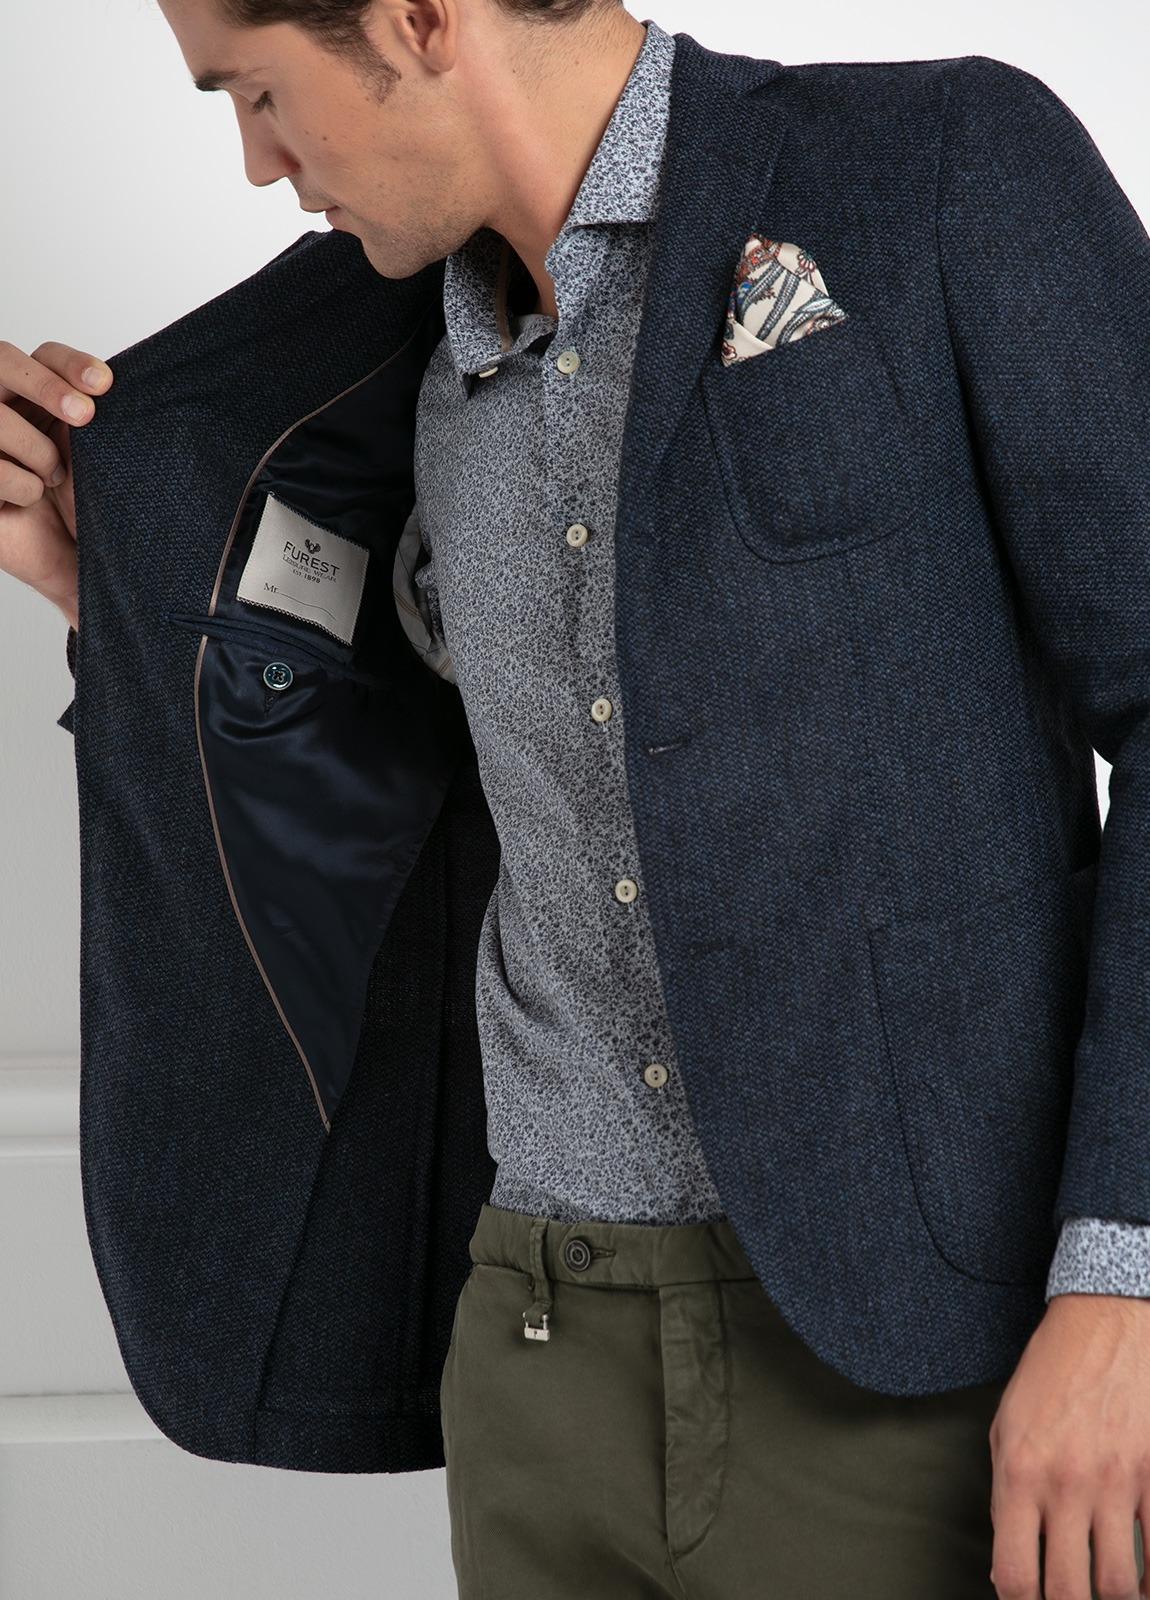 Americana SOFT JACKET Slim Fit, tejido textura color azul oscuro. 97% Lana, 3% Cashmere. - Ítem2